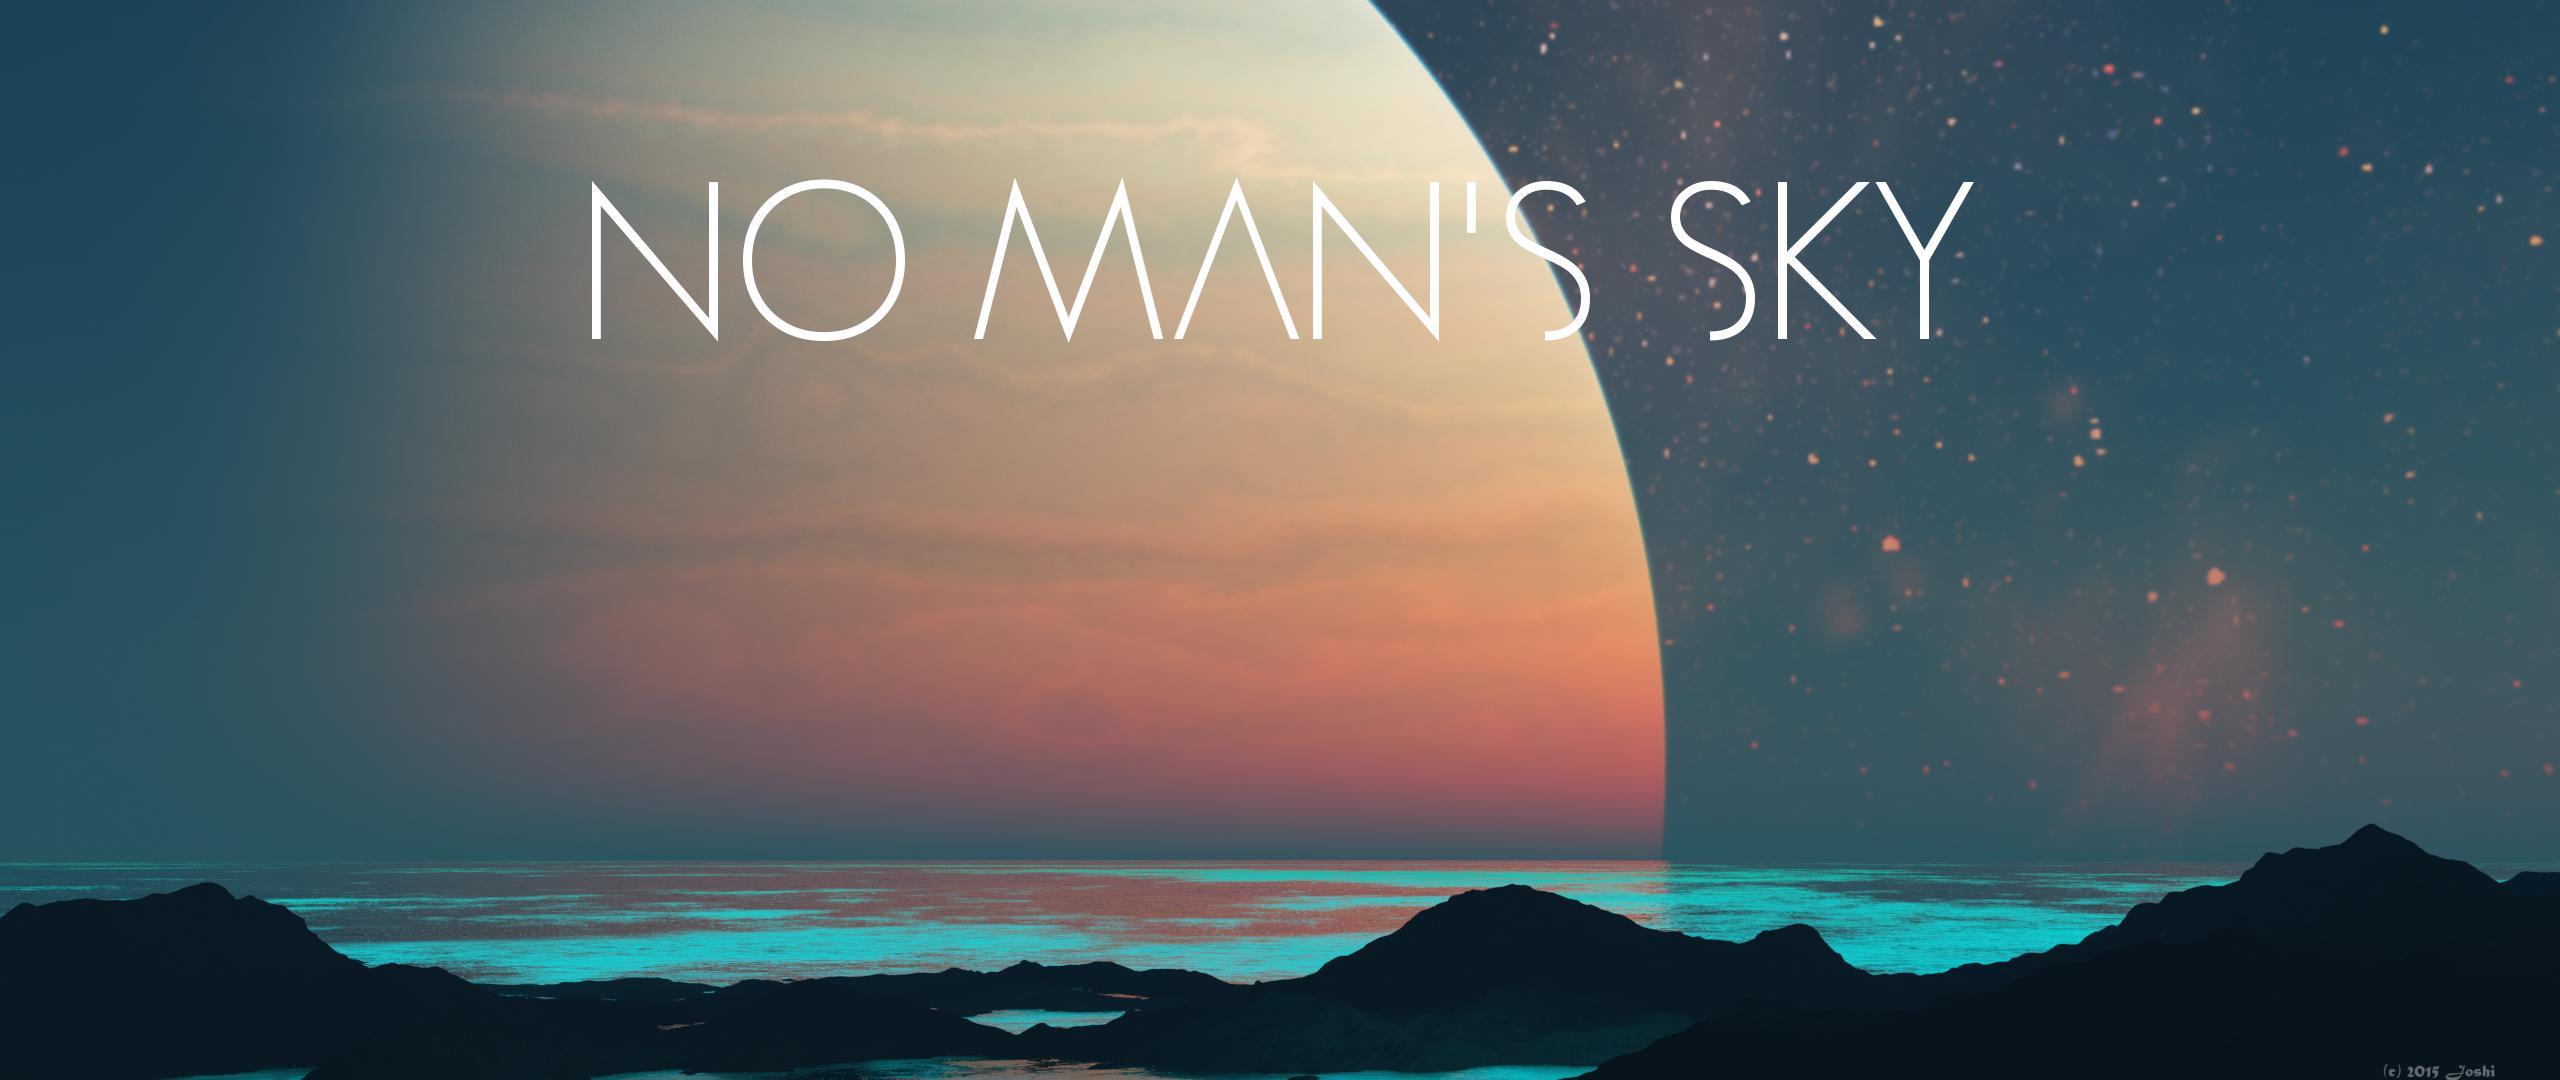 Wallpaper Planet Agua Azul No Man S Sky 2560x1080 Tobestyled